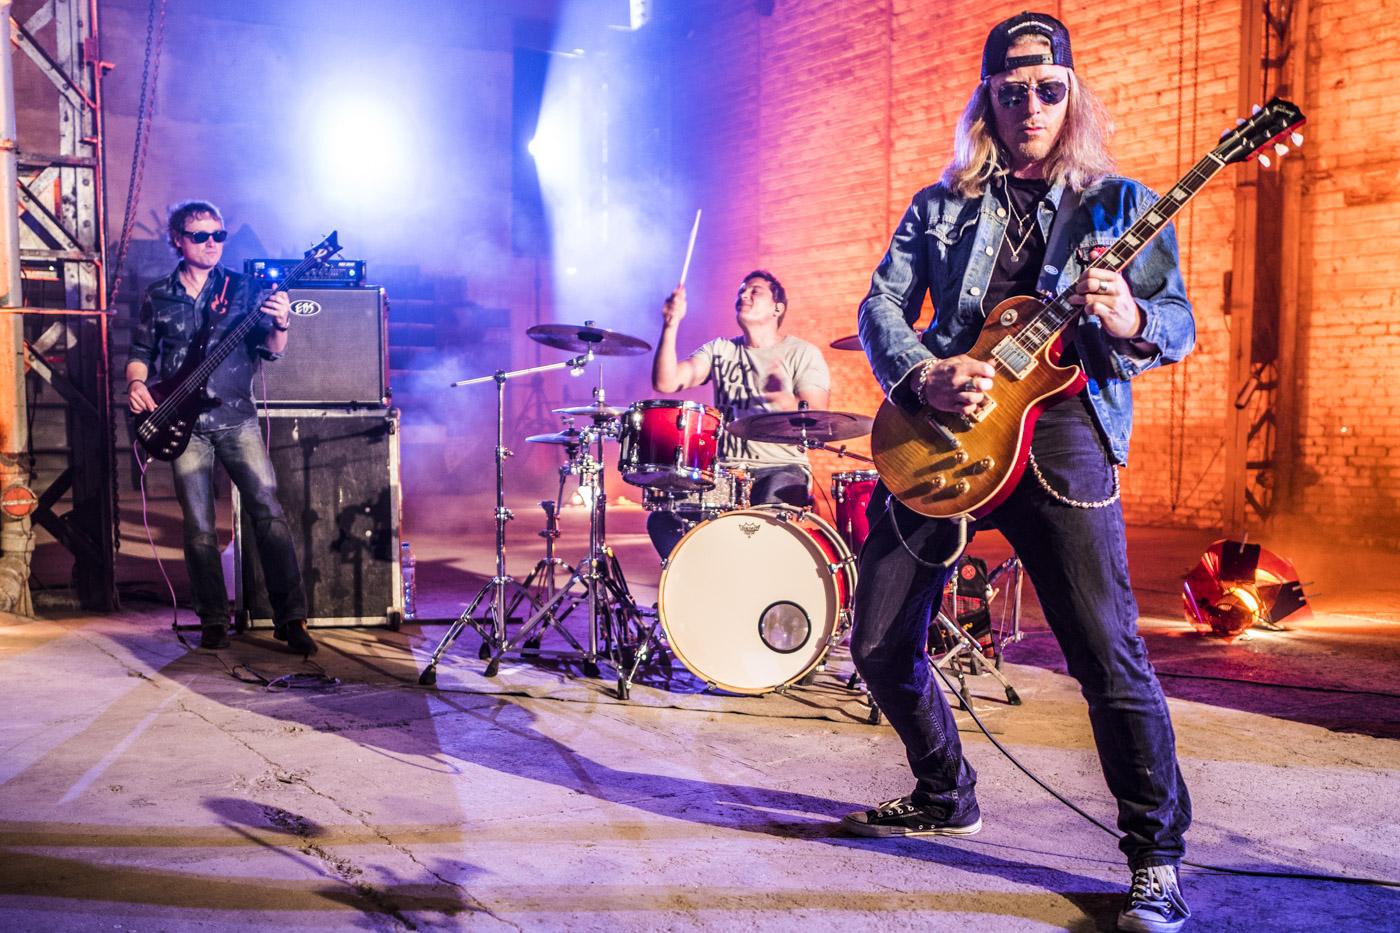 MAT NINAT   PROFUSION rock n' roll power trio based in Paris